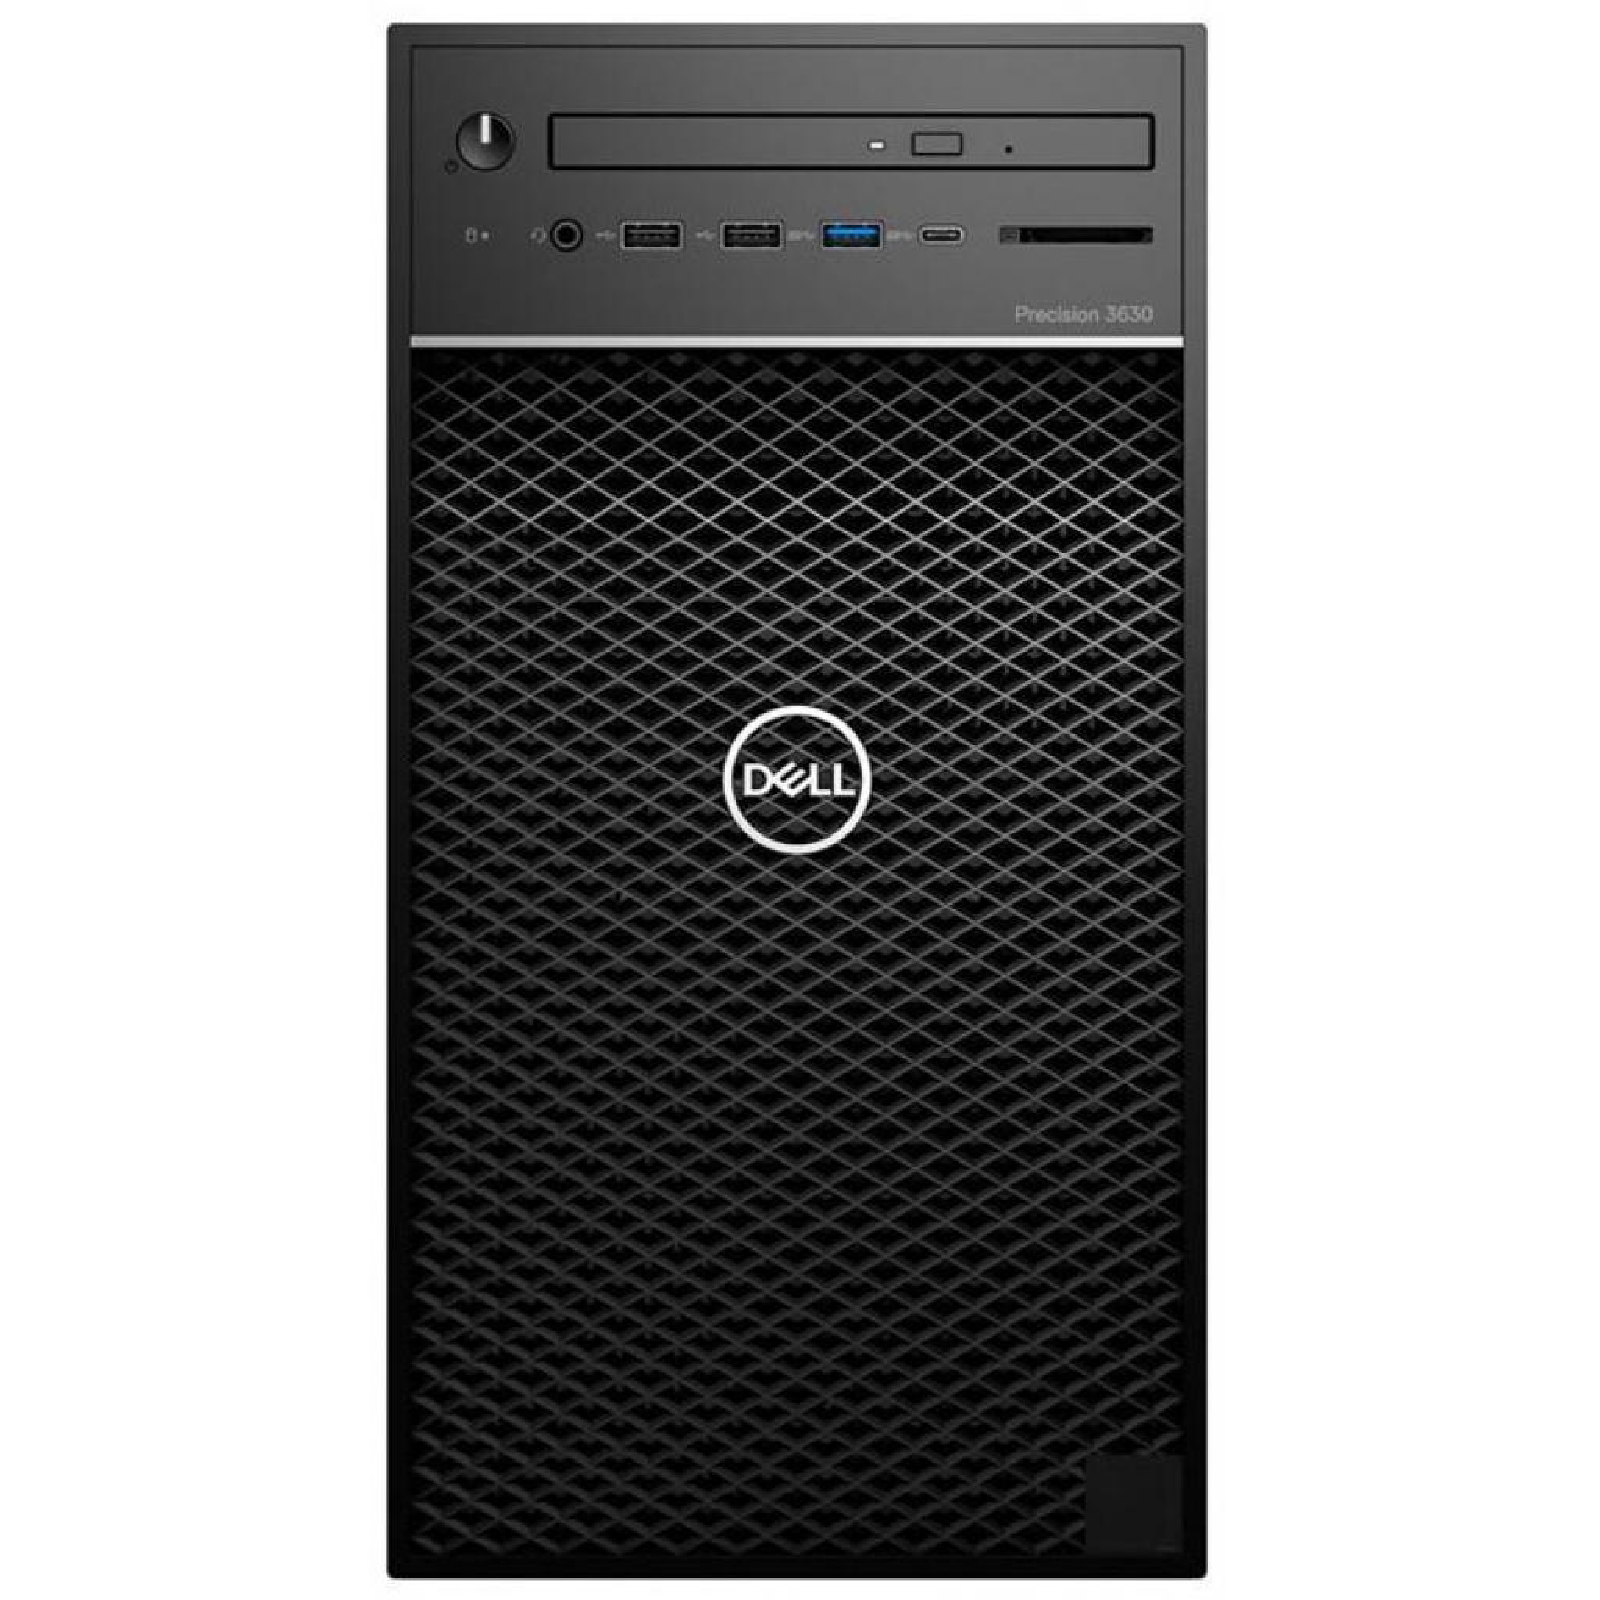 Комп'ютер Dell Precision 3630 Tower/ Xeon E-2124G (210-AOZN-DIX#1-08) зображення 2